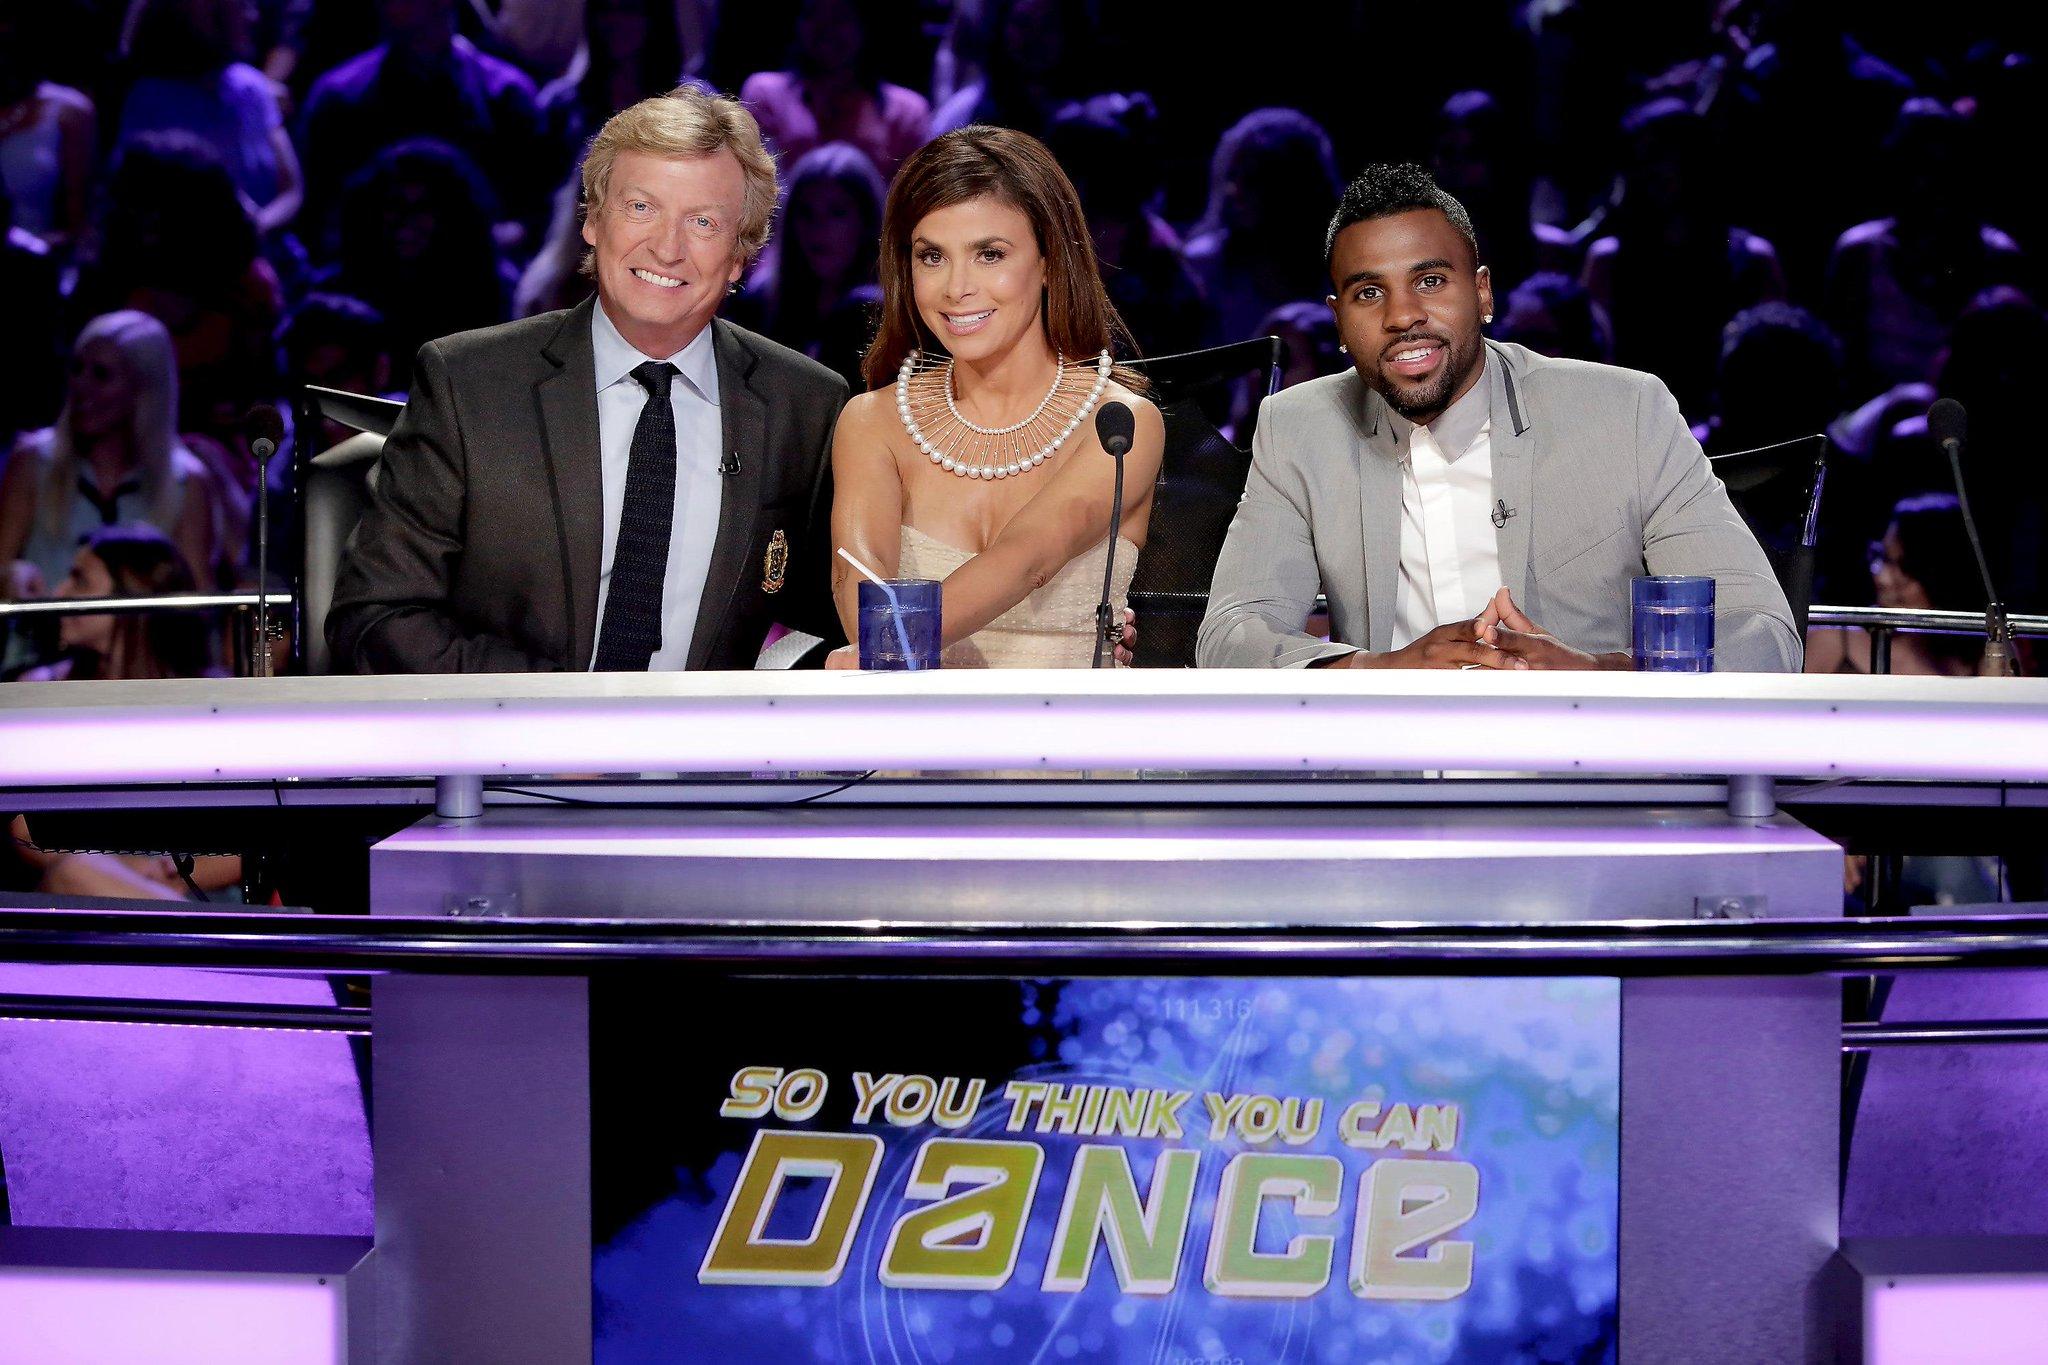 RT @DANCEonFOX: See what the judges, @jessicaJJrabone & @Edsonjuarez19 said about Monday's show! http://t.co/PVjZ61F5qh #sytycd http://t.co…